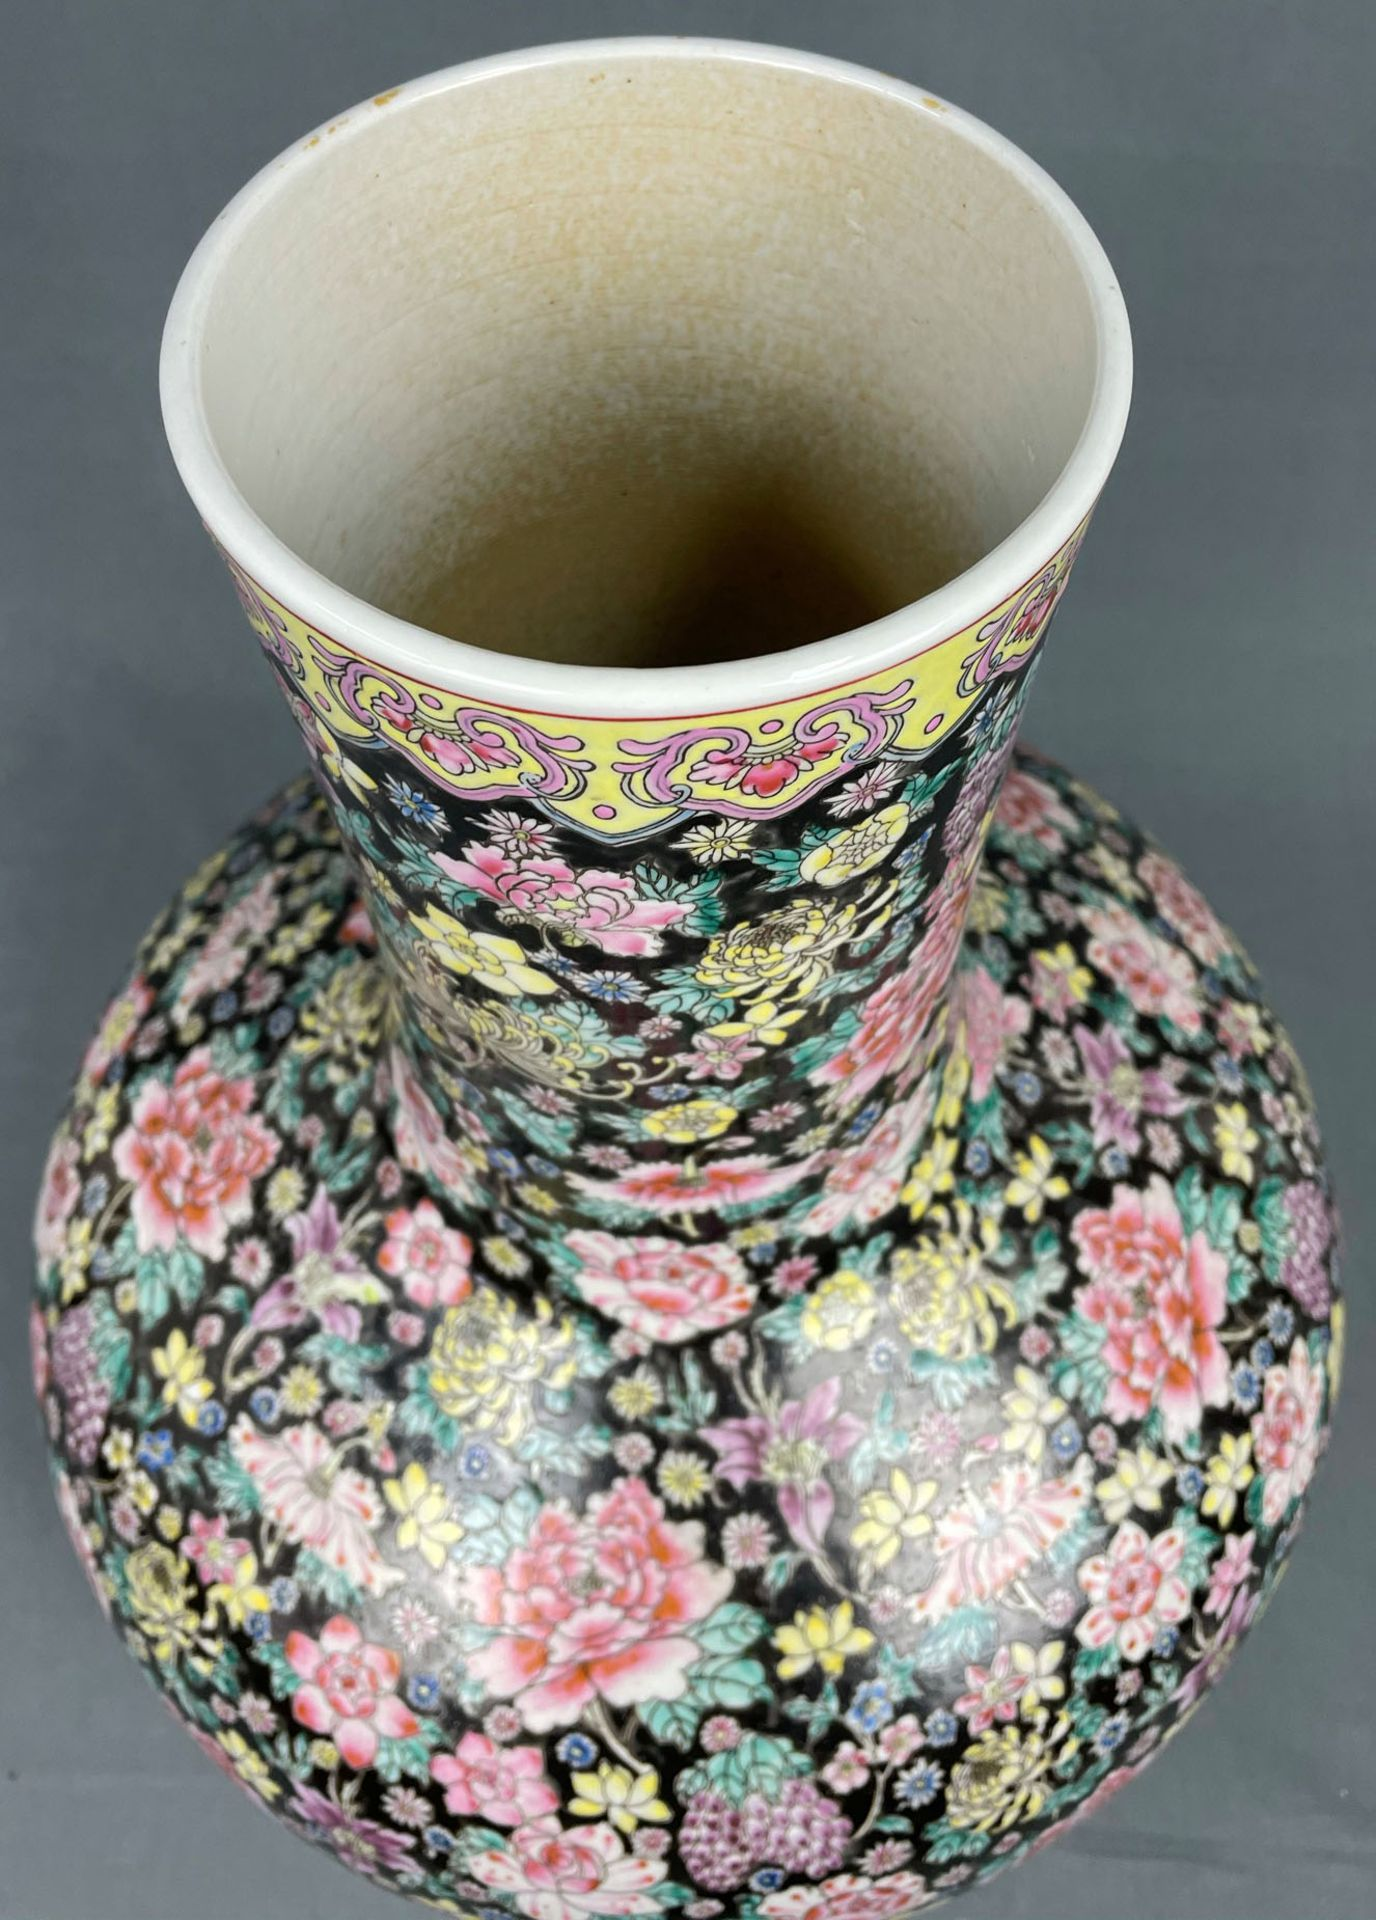 China. Porzellan. Vase. Stempelmarke circa 1930 - 1950. 53 cm hoch. - Image 7 of 20